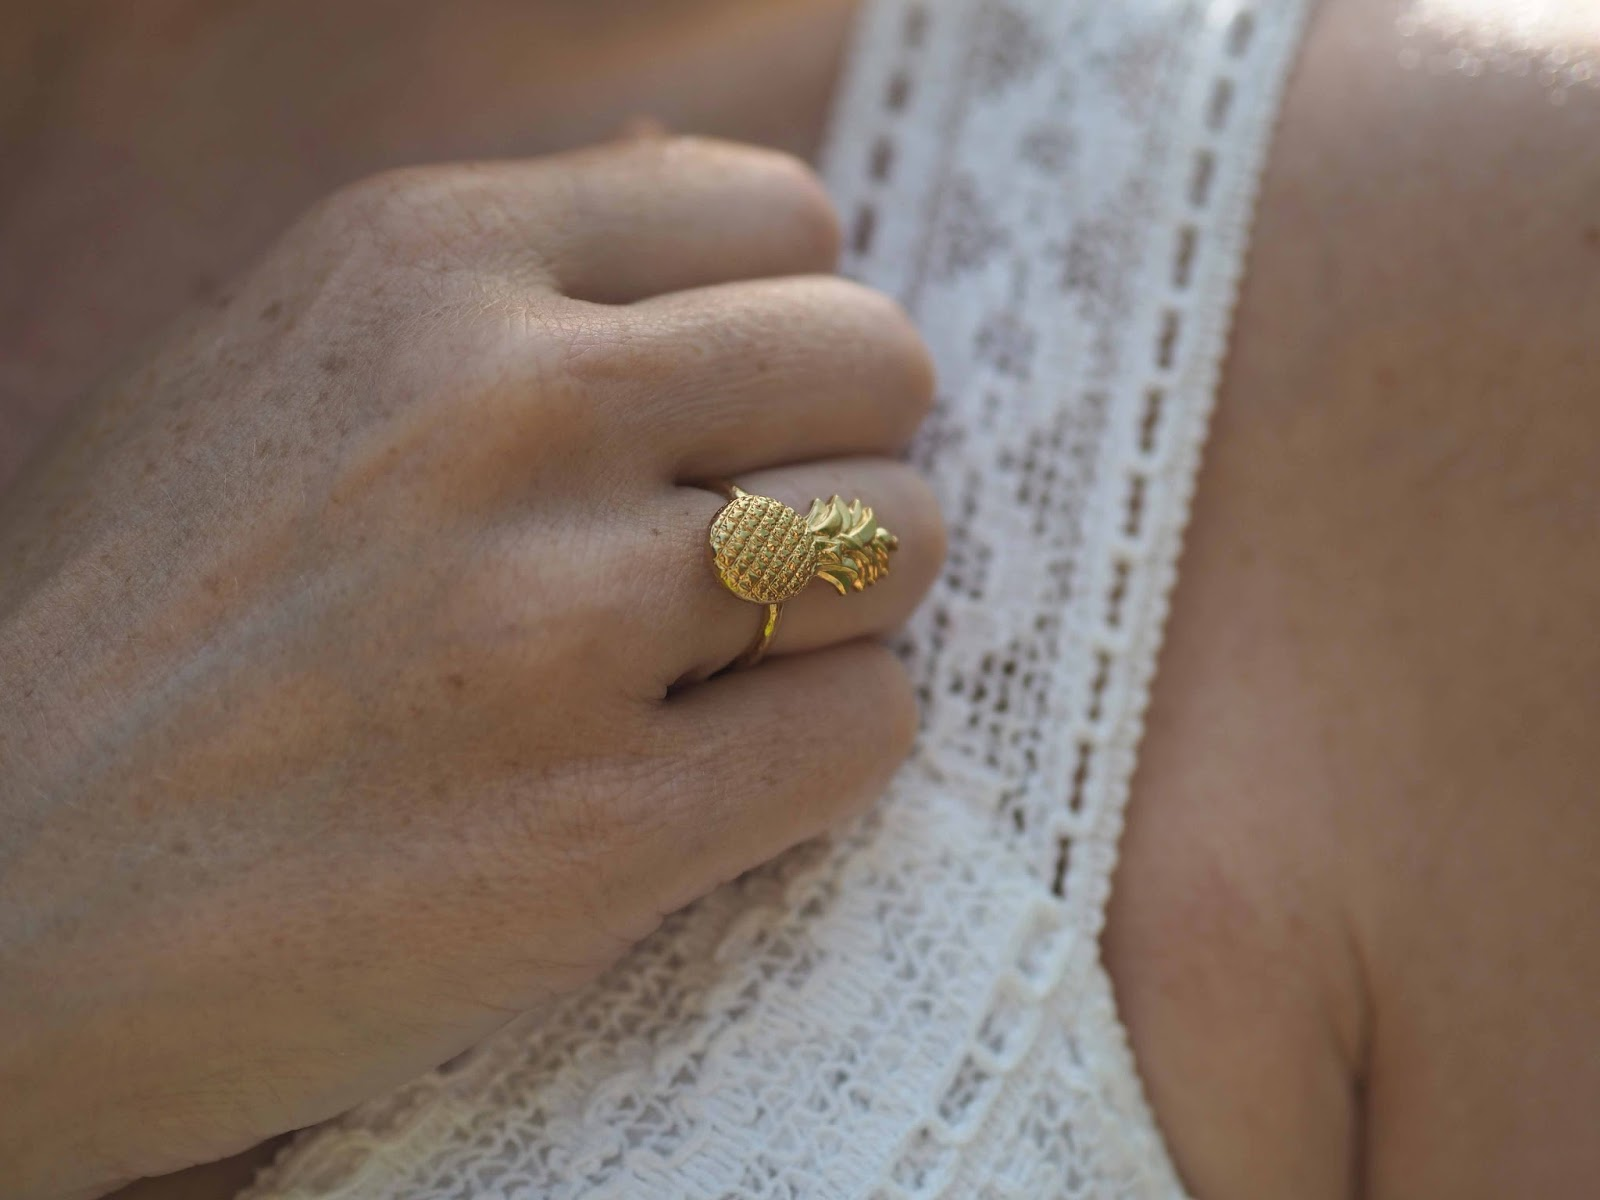 Gold pineapple ring